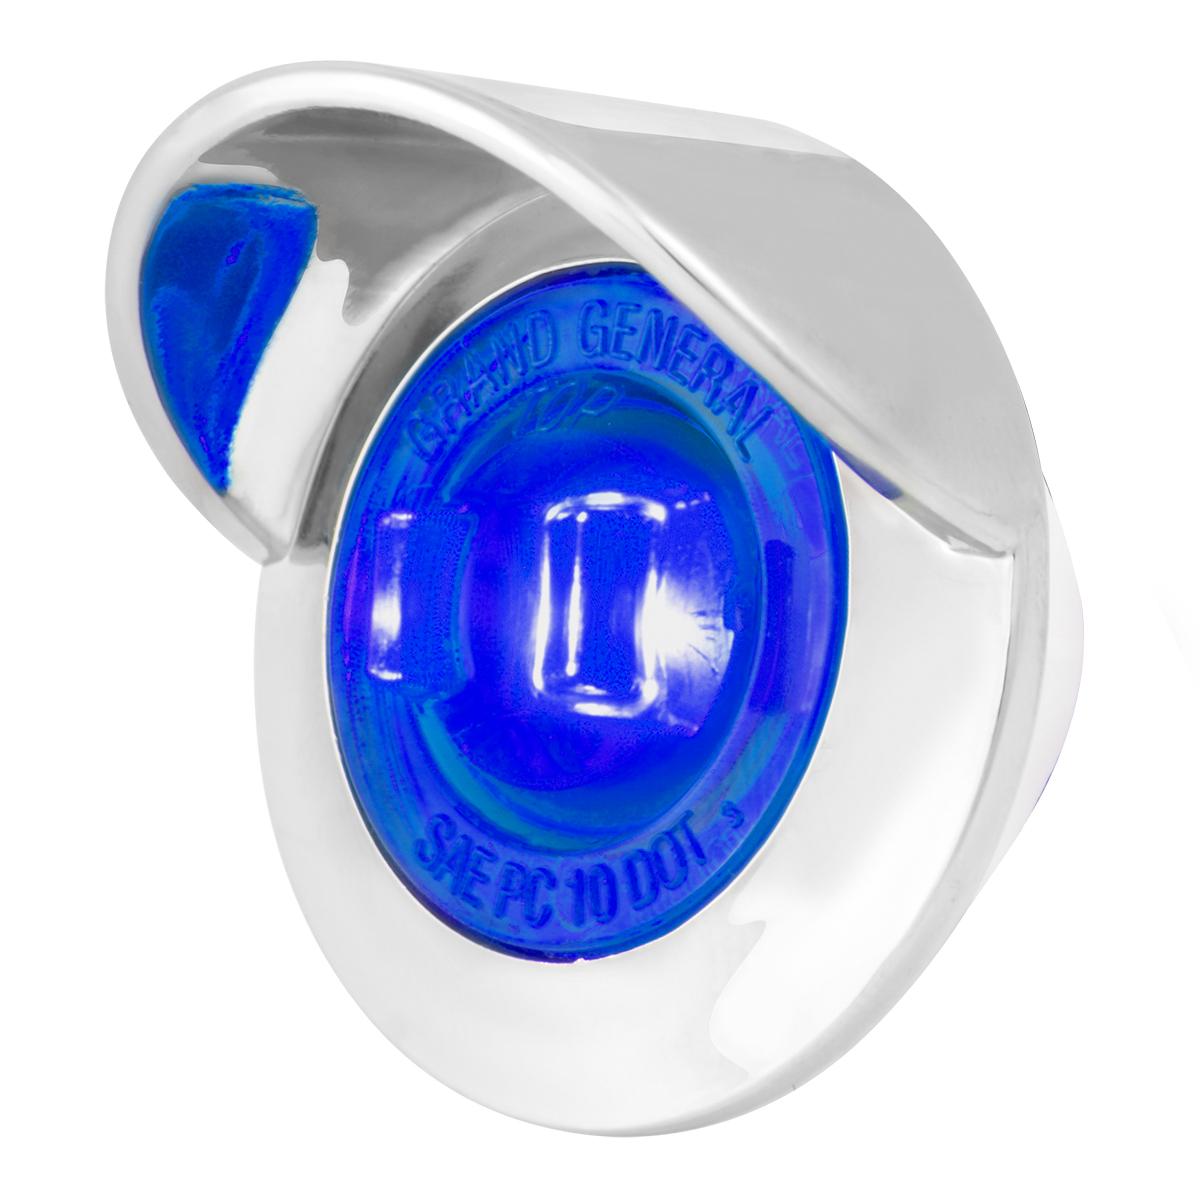 "75235 1-1/4"" Dia. Dual Function LED Light with Chrome Plastic Bezel w/ Visor and Nut"